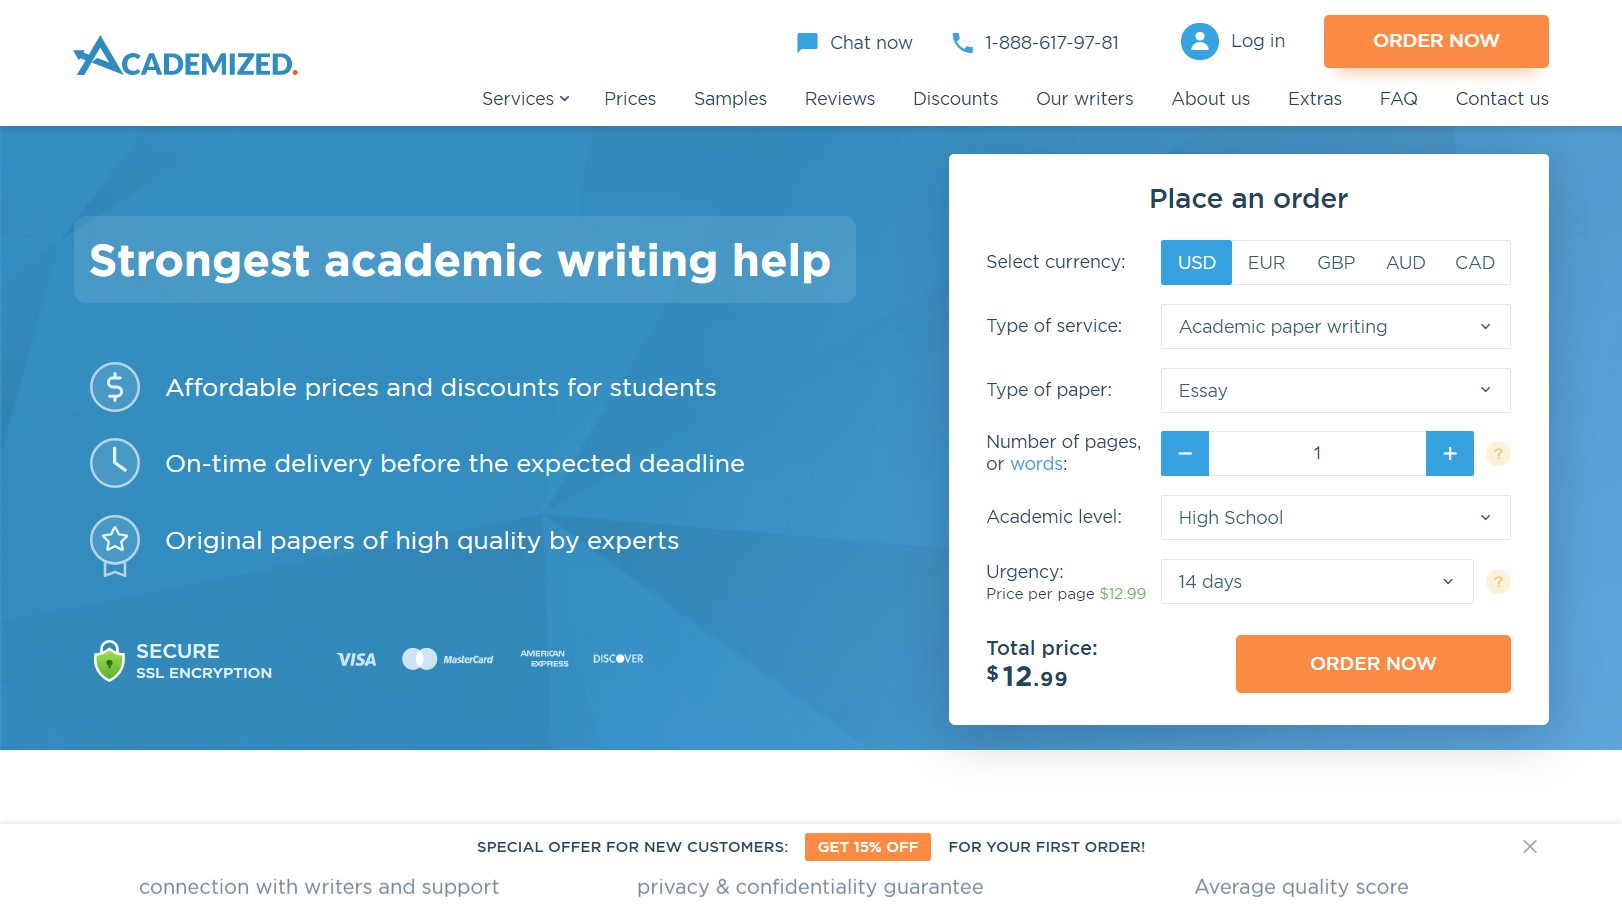 Academized Writing Service